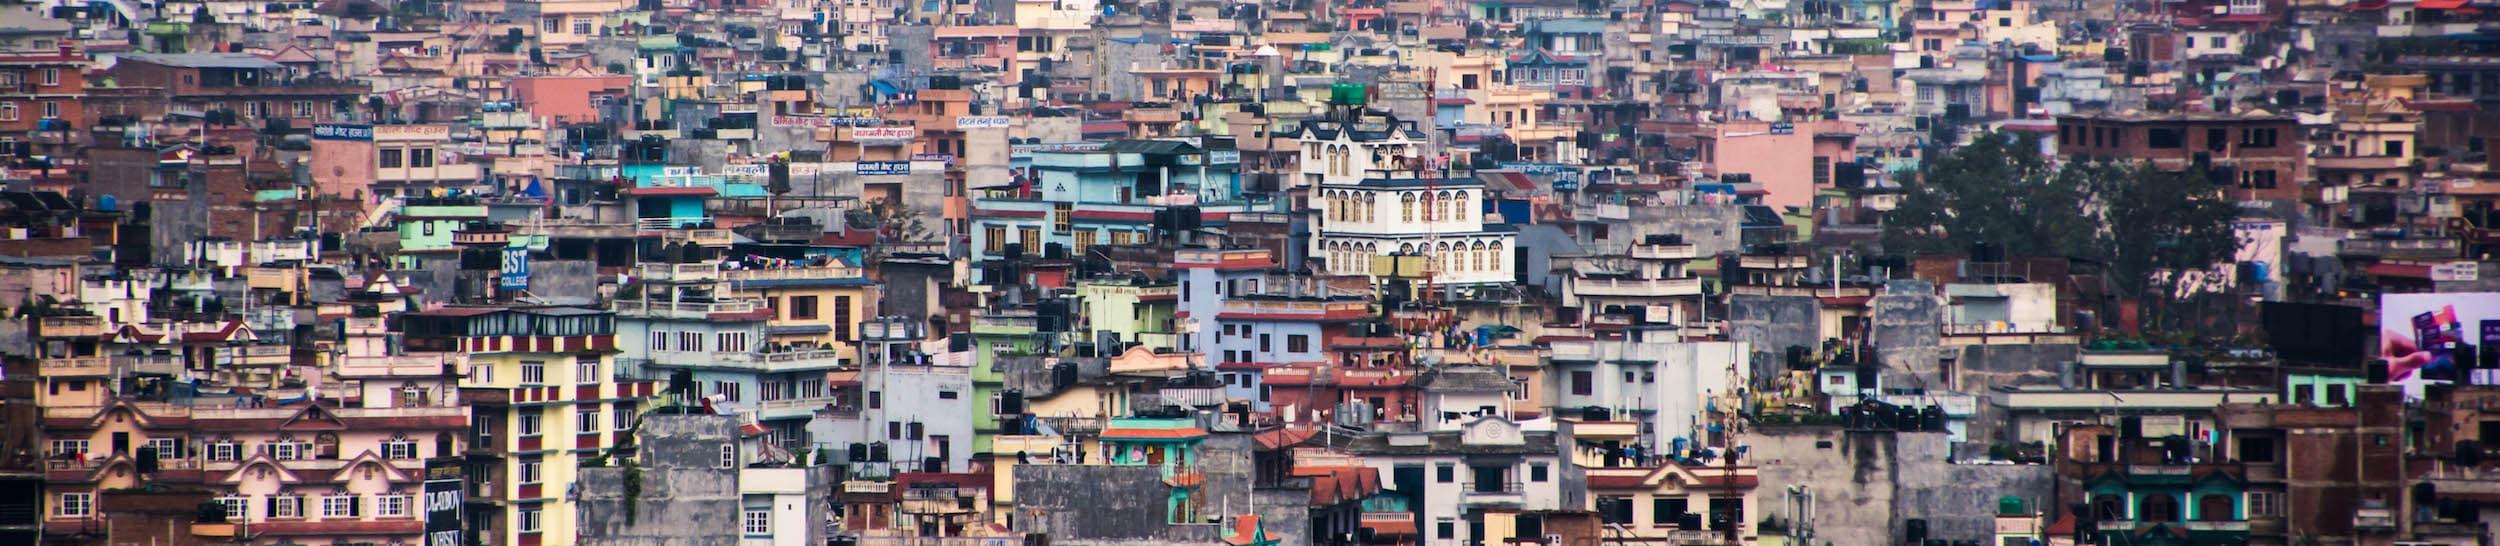 Skyline of Kathmandu